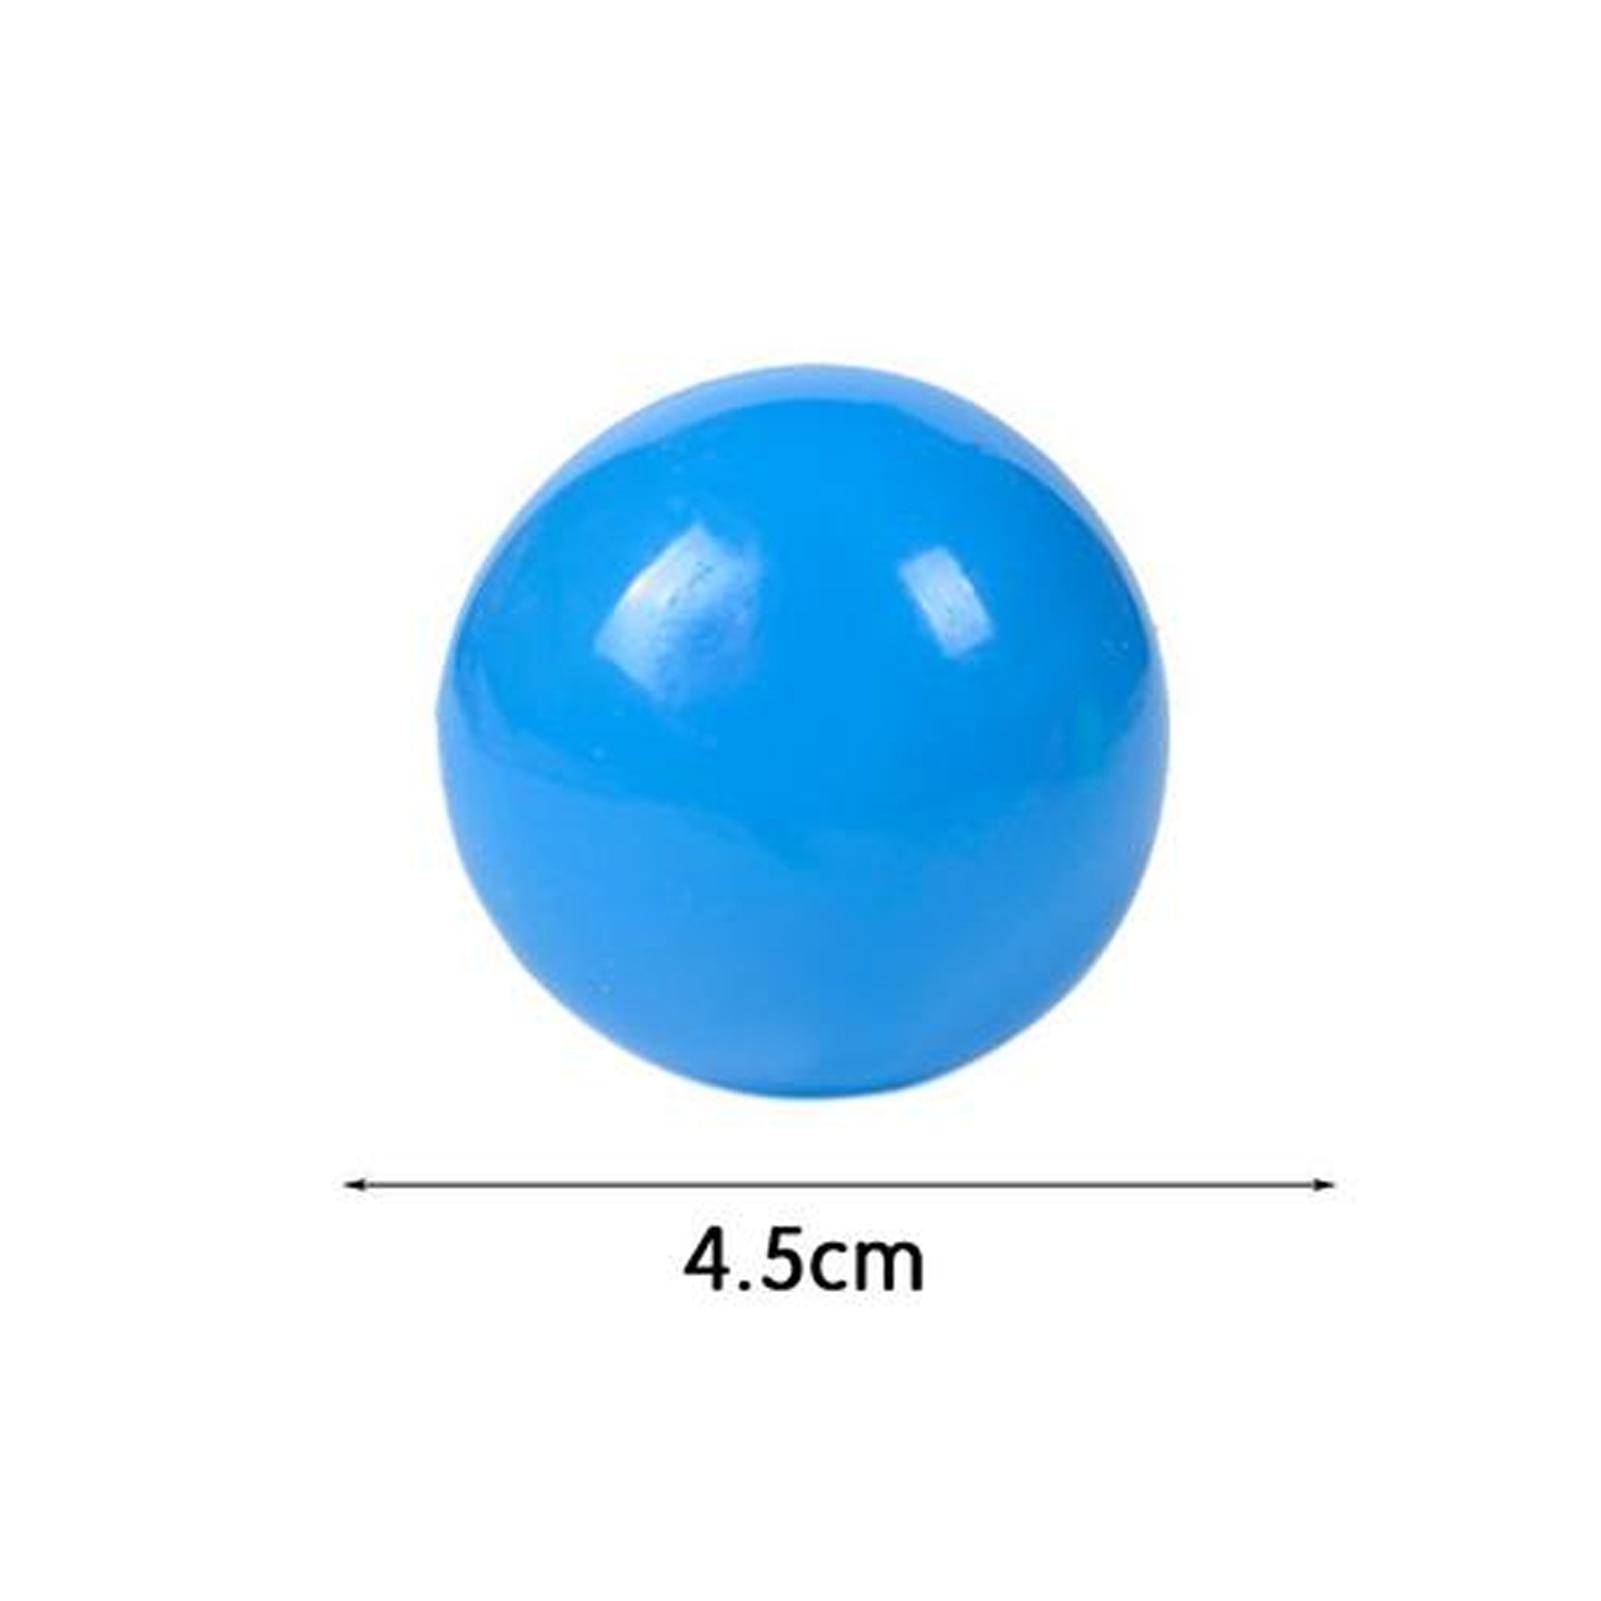 Fidget Sensory Toy Set Stress Relief Toys Autism Anxiety Relief Stress Pop Bubble Fidget img5